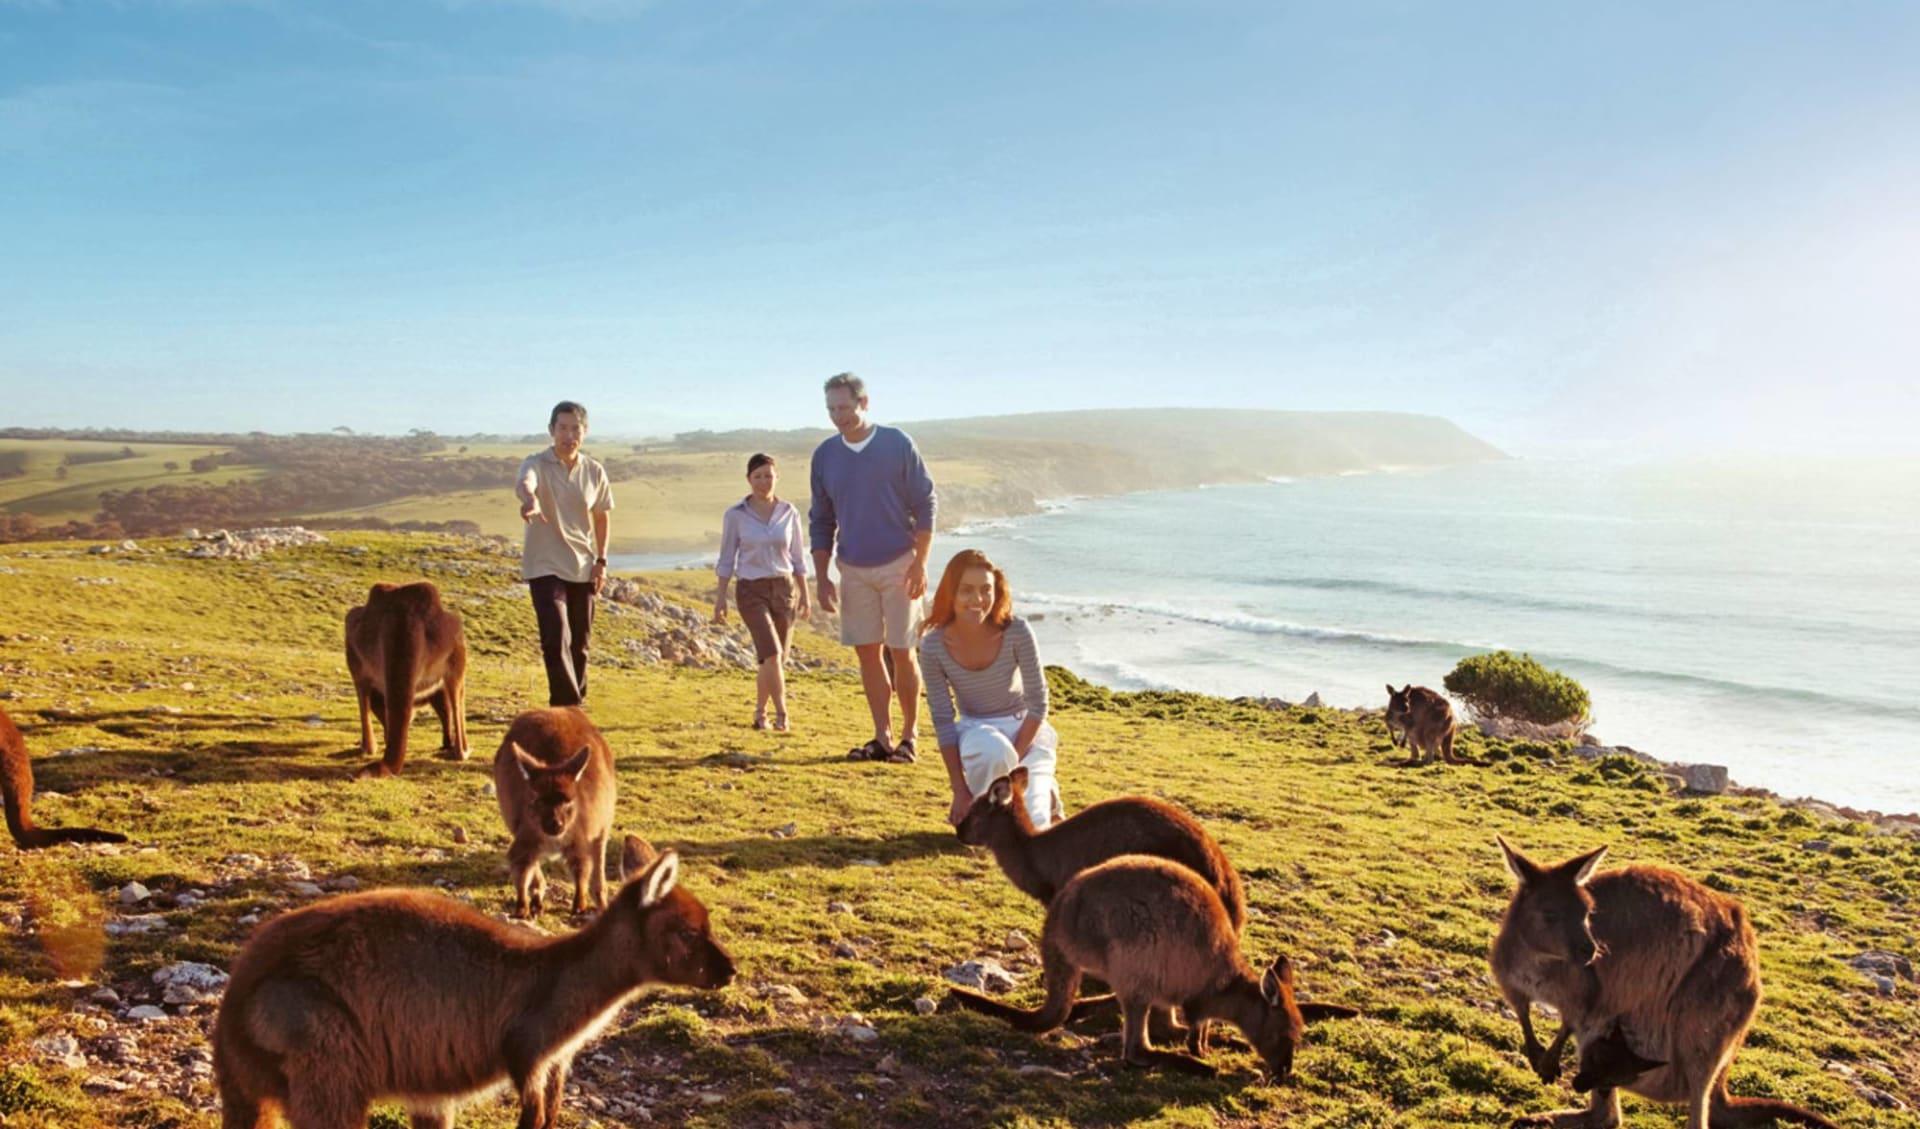 Kangaroo Island Adventure Tour ab Adelaide: Australien - Kangaroo Island - Familie mit Kangaroos